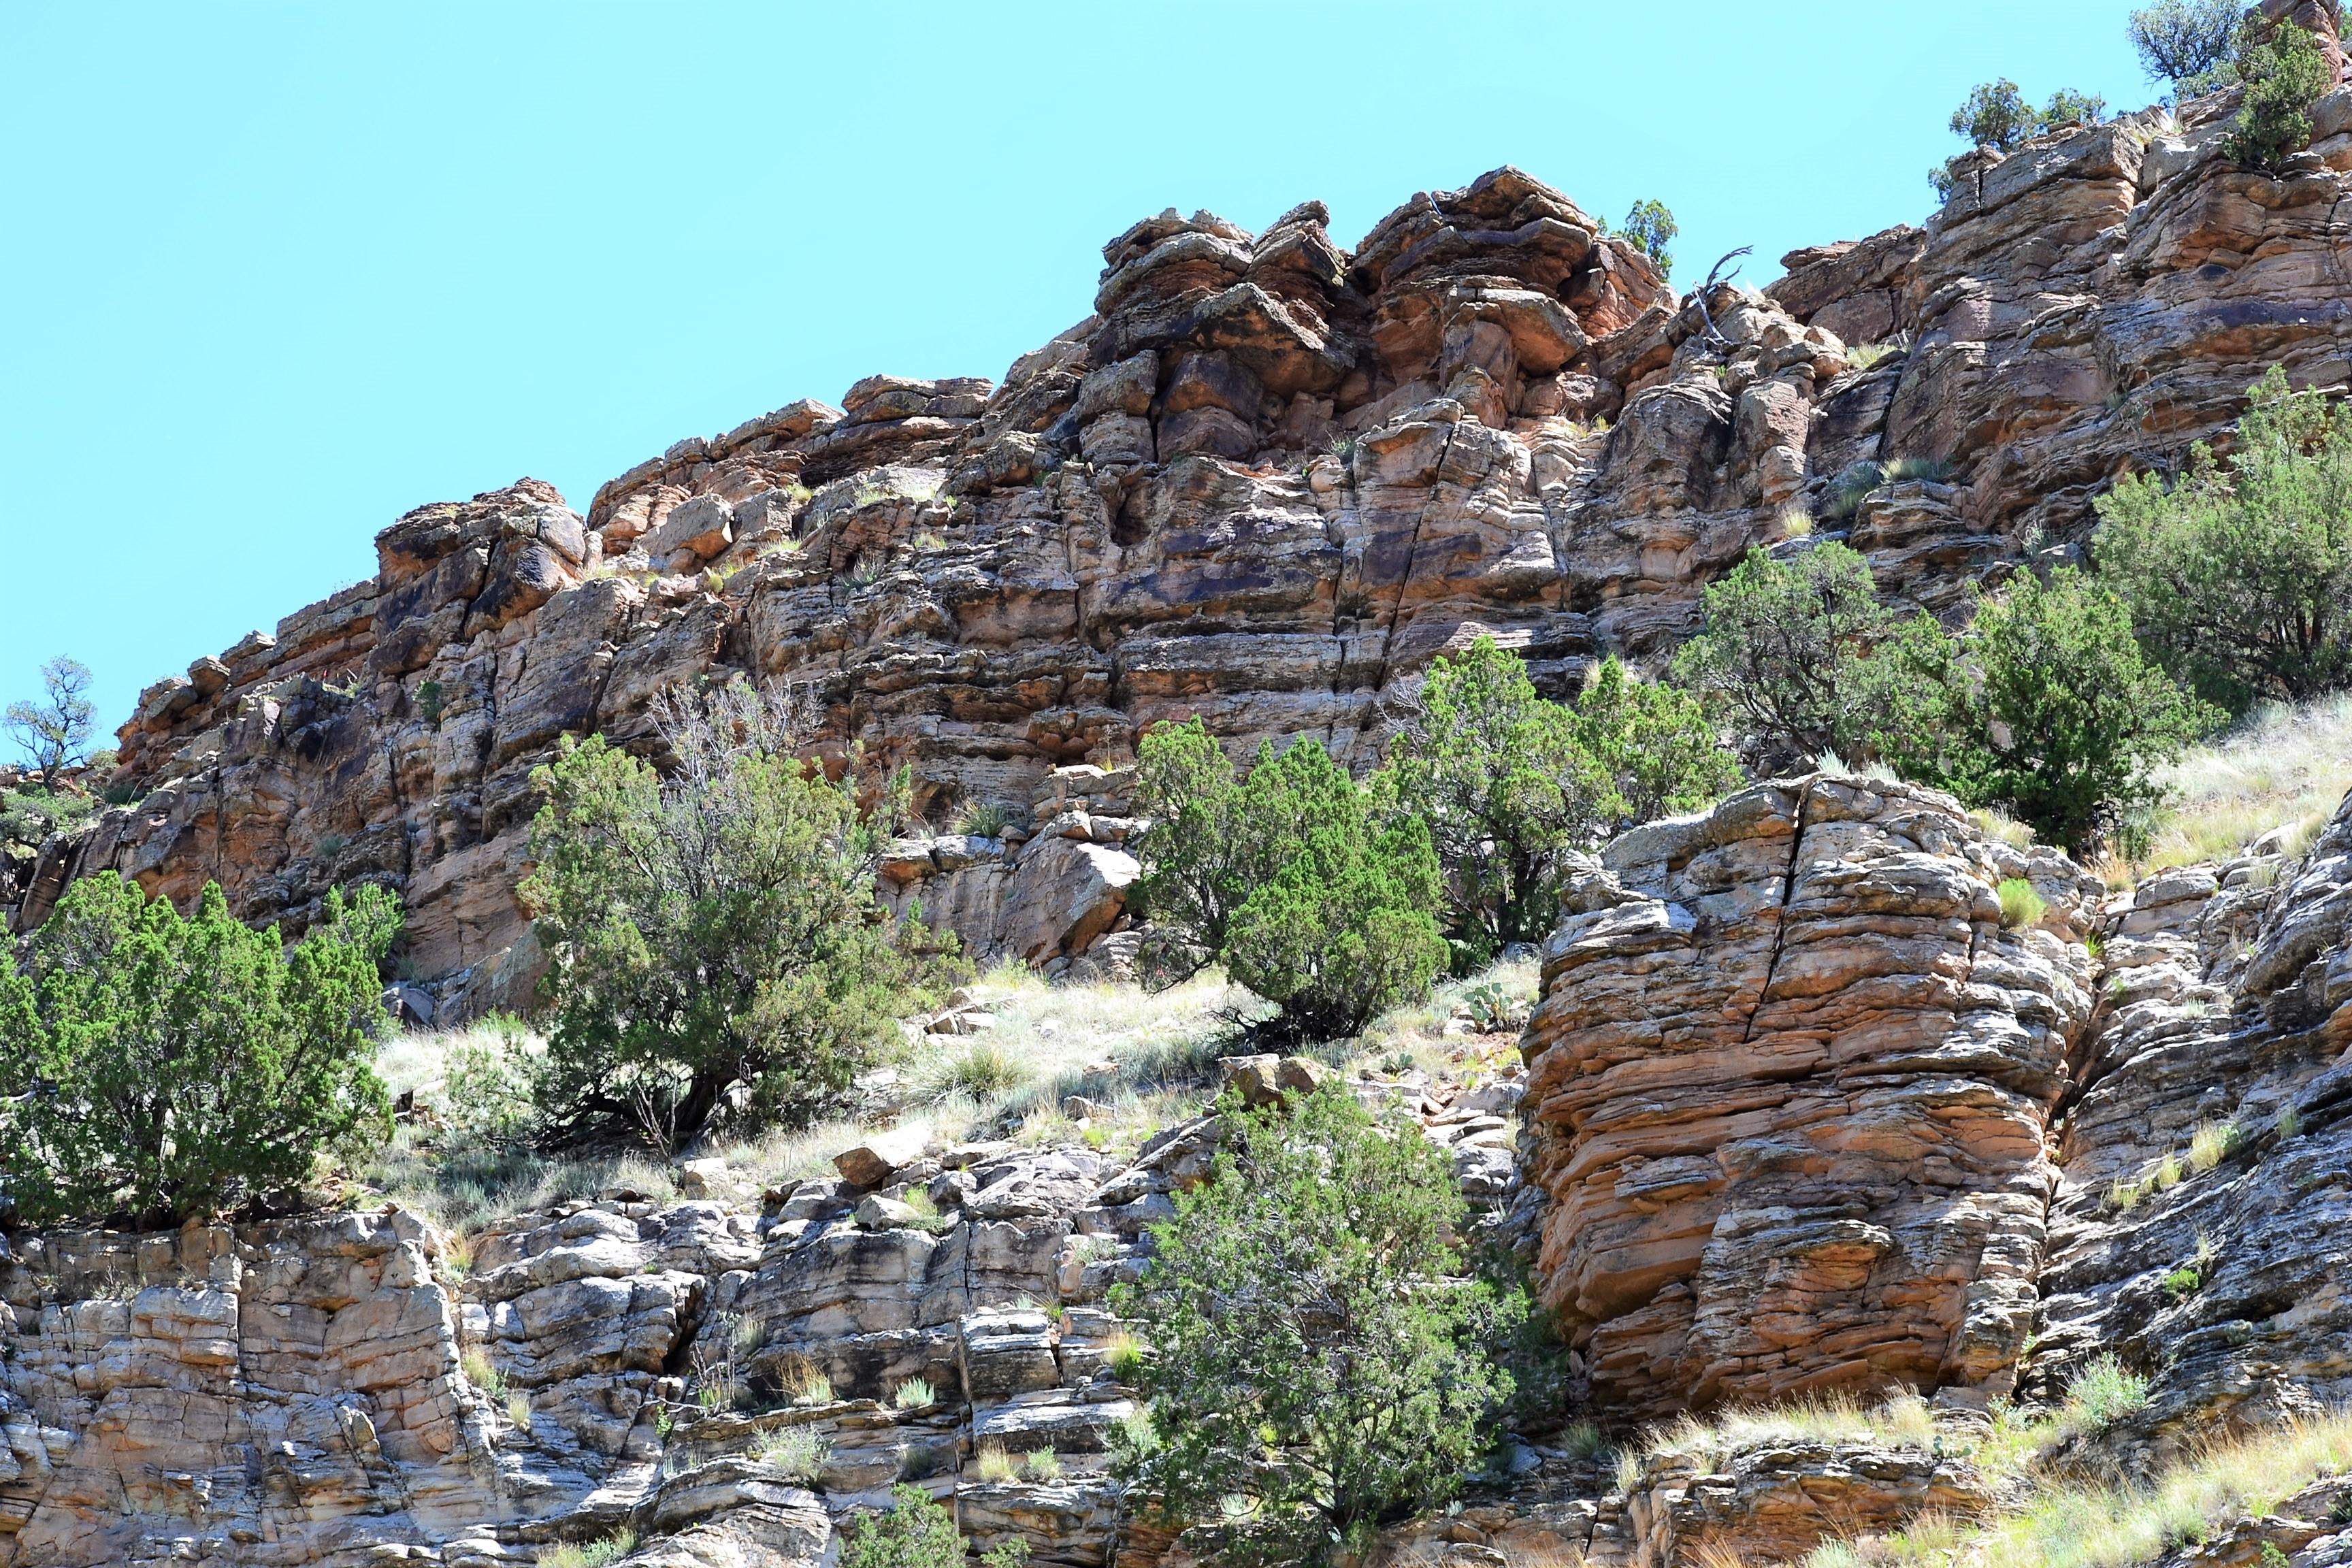 DSC_0020Sandstone Bluff Above the Pecos